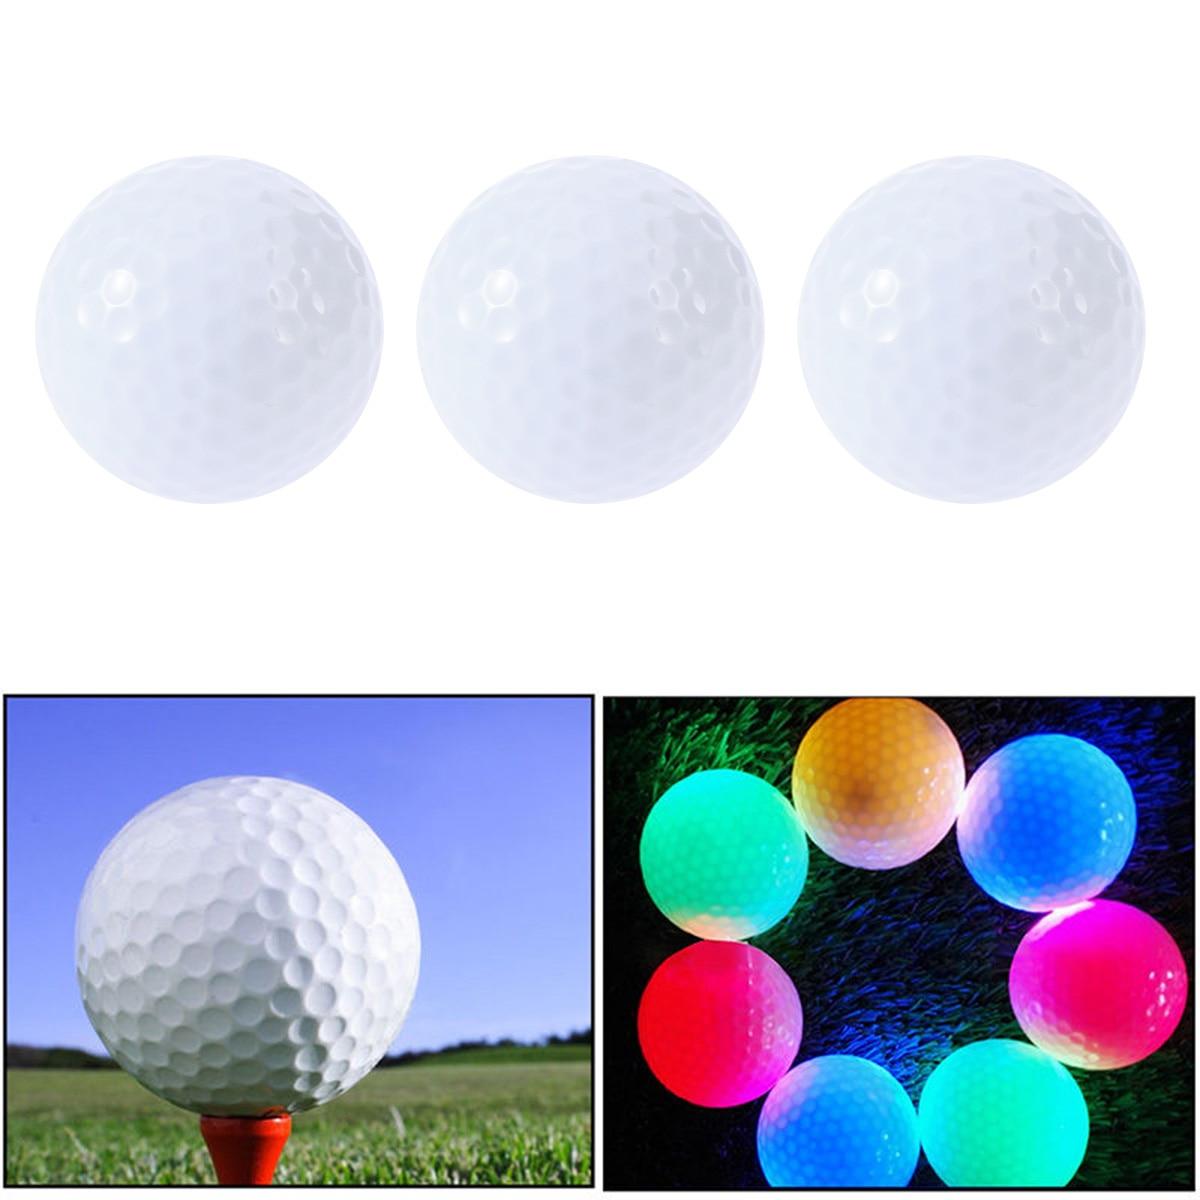 3 Pcs Luminous Night Golf Balls LED Light Up Golf Balls Glow In The Dark Bright Long Lasting Reusable Night Golf Ball